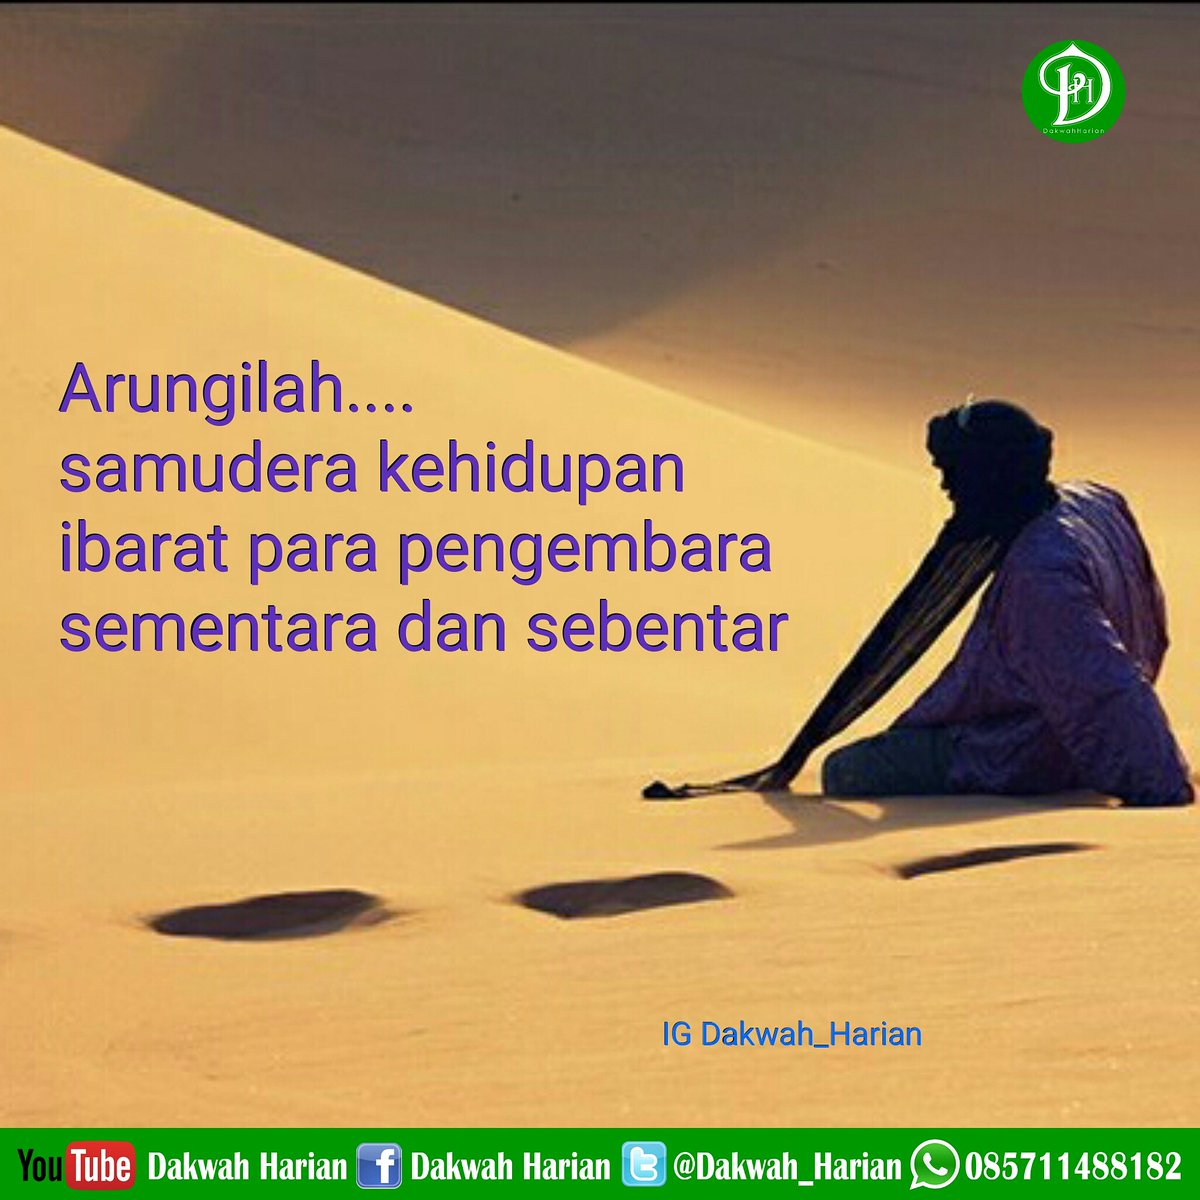 #BersamaMerawatAir